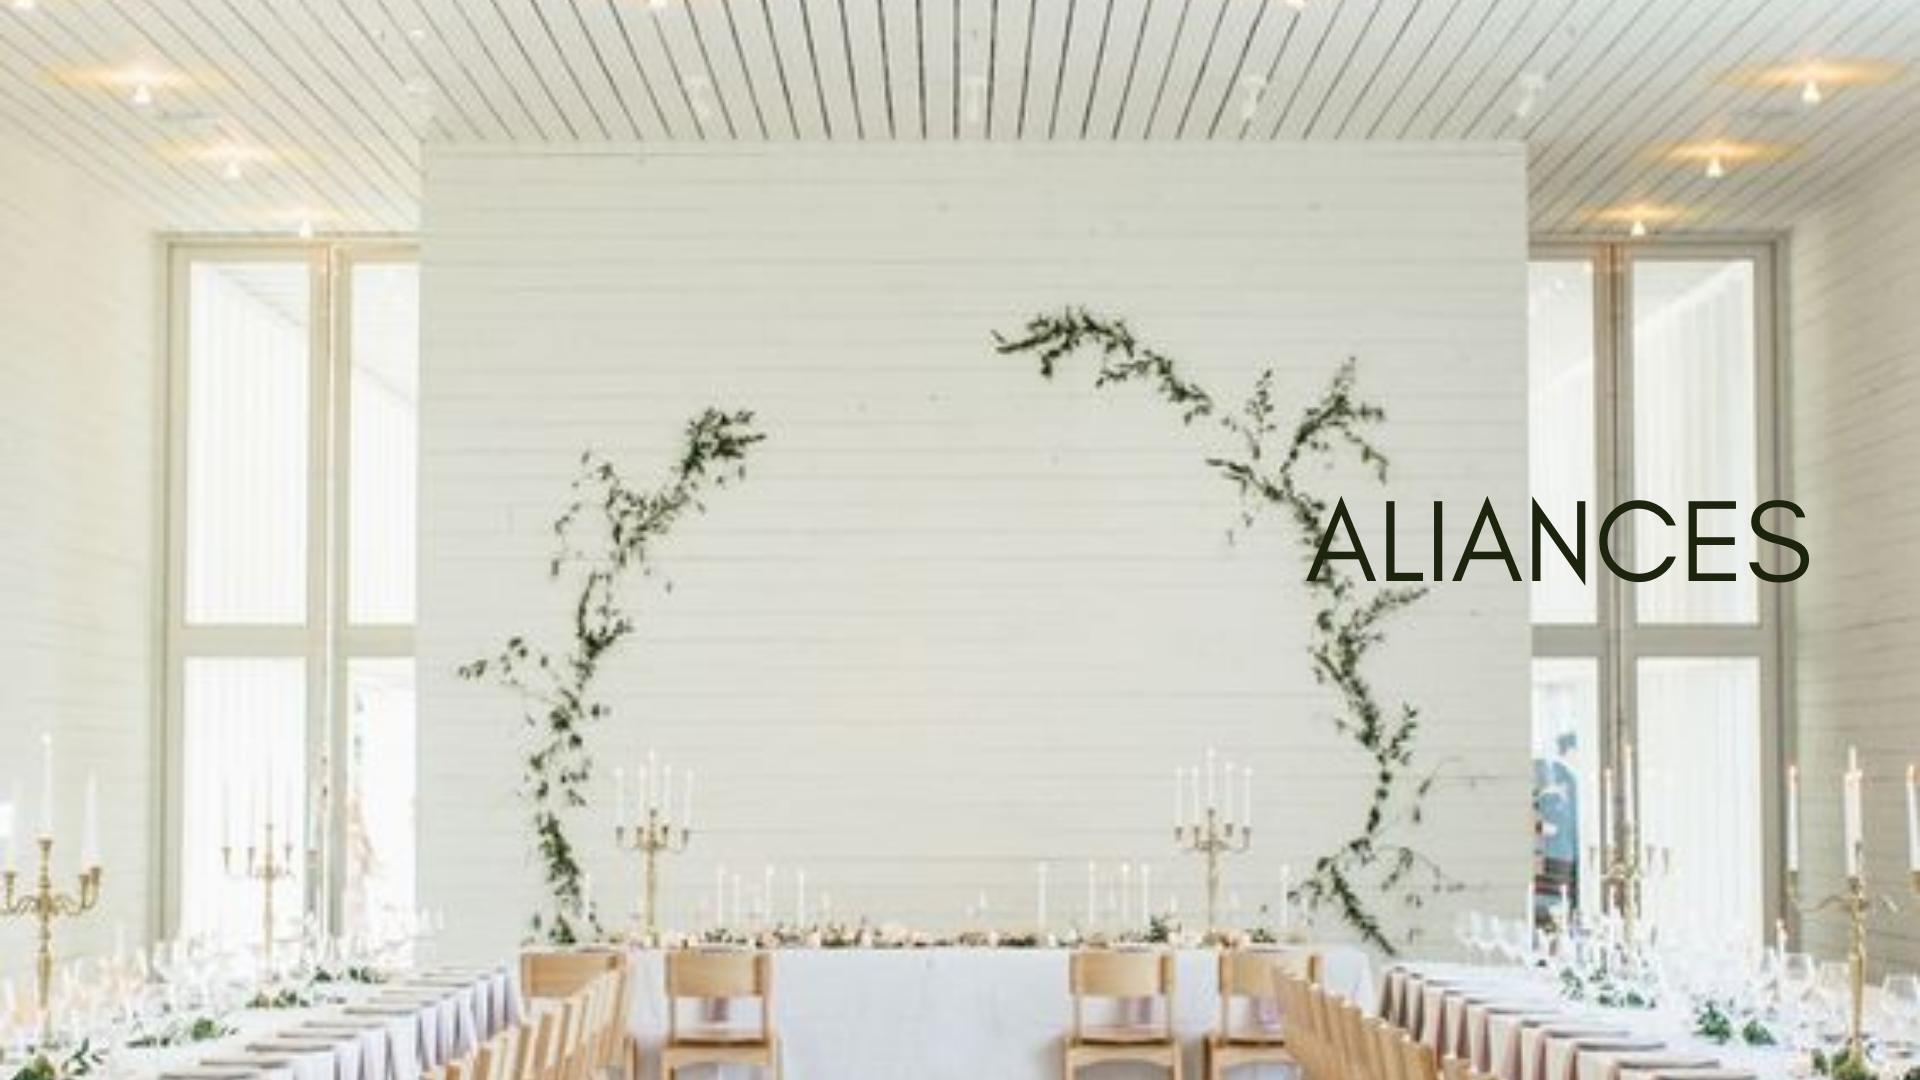 Aliances matrimoni or